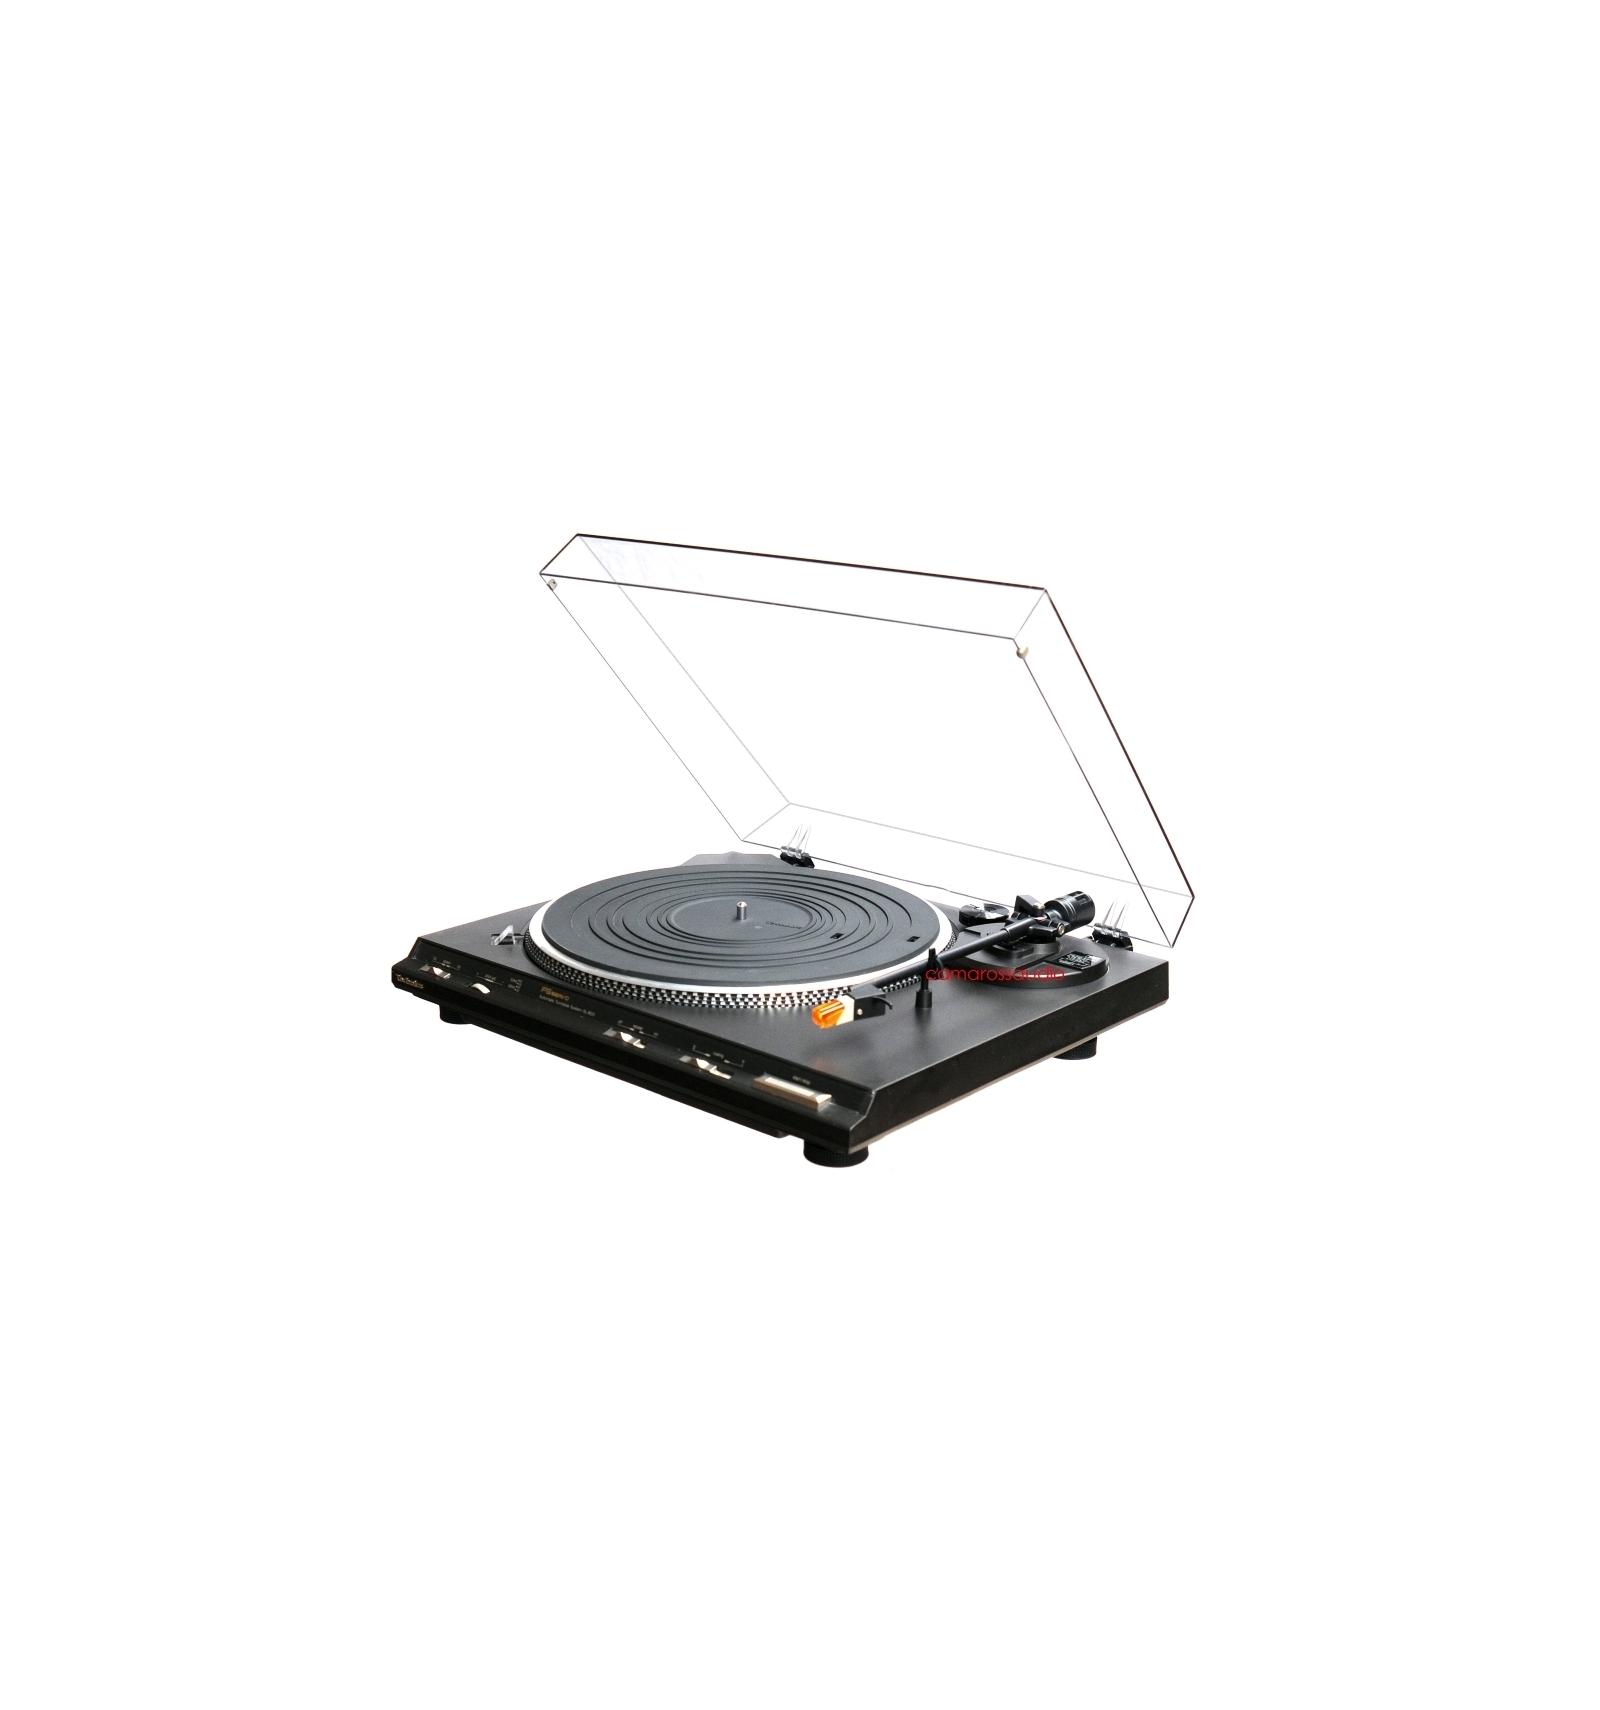 technics sl-bd3 full automatic turntable